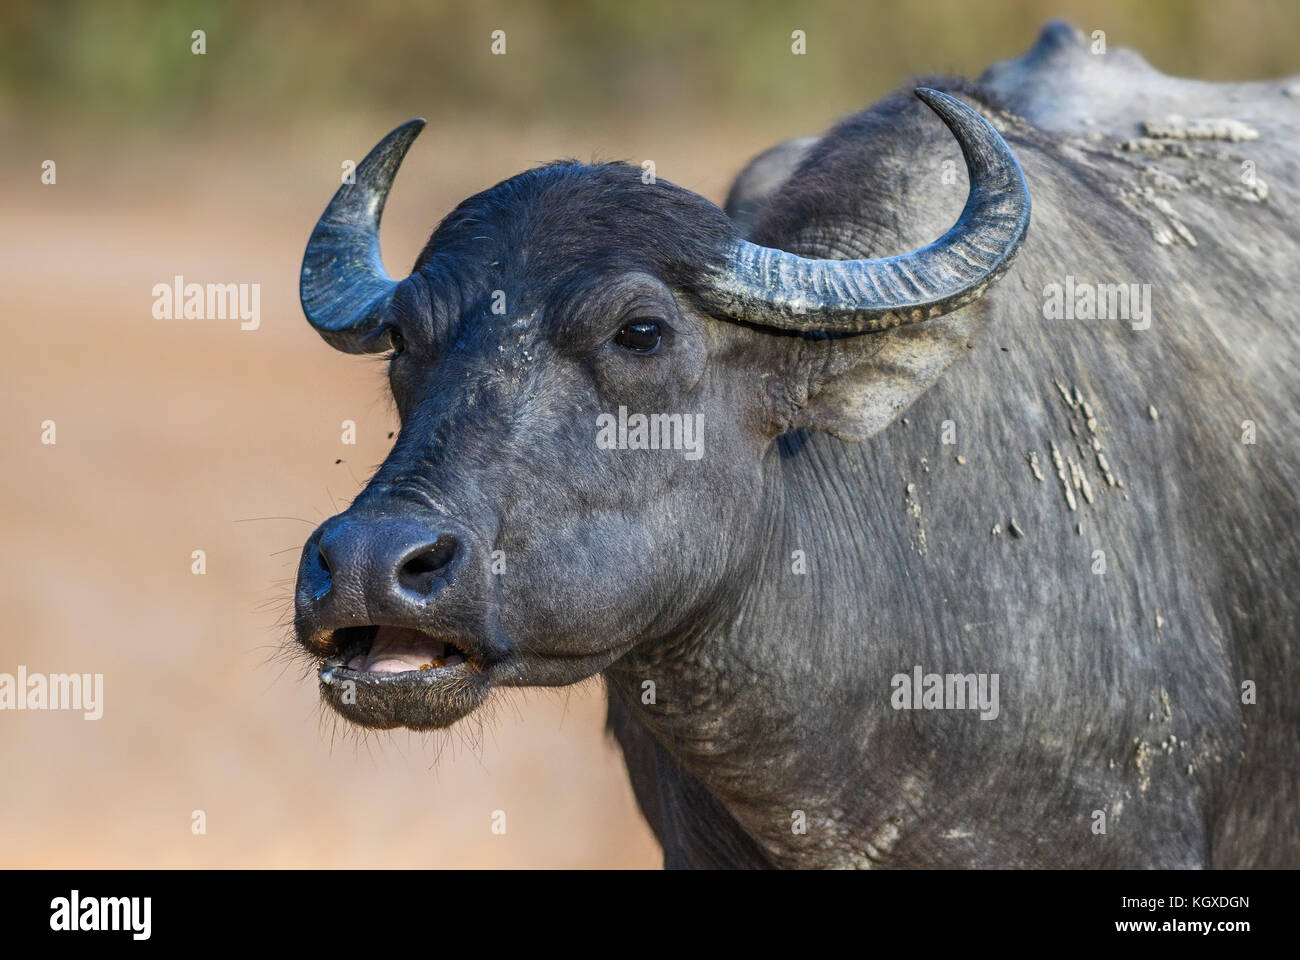 Sri Lankan Wild Buffalo - Bubalus arnee migona, Sri Lanka - Stock Image